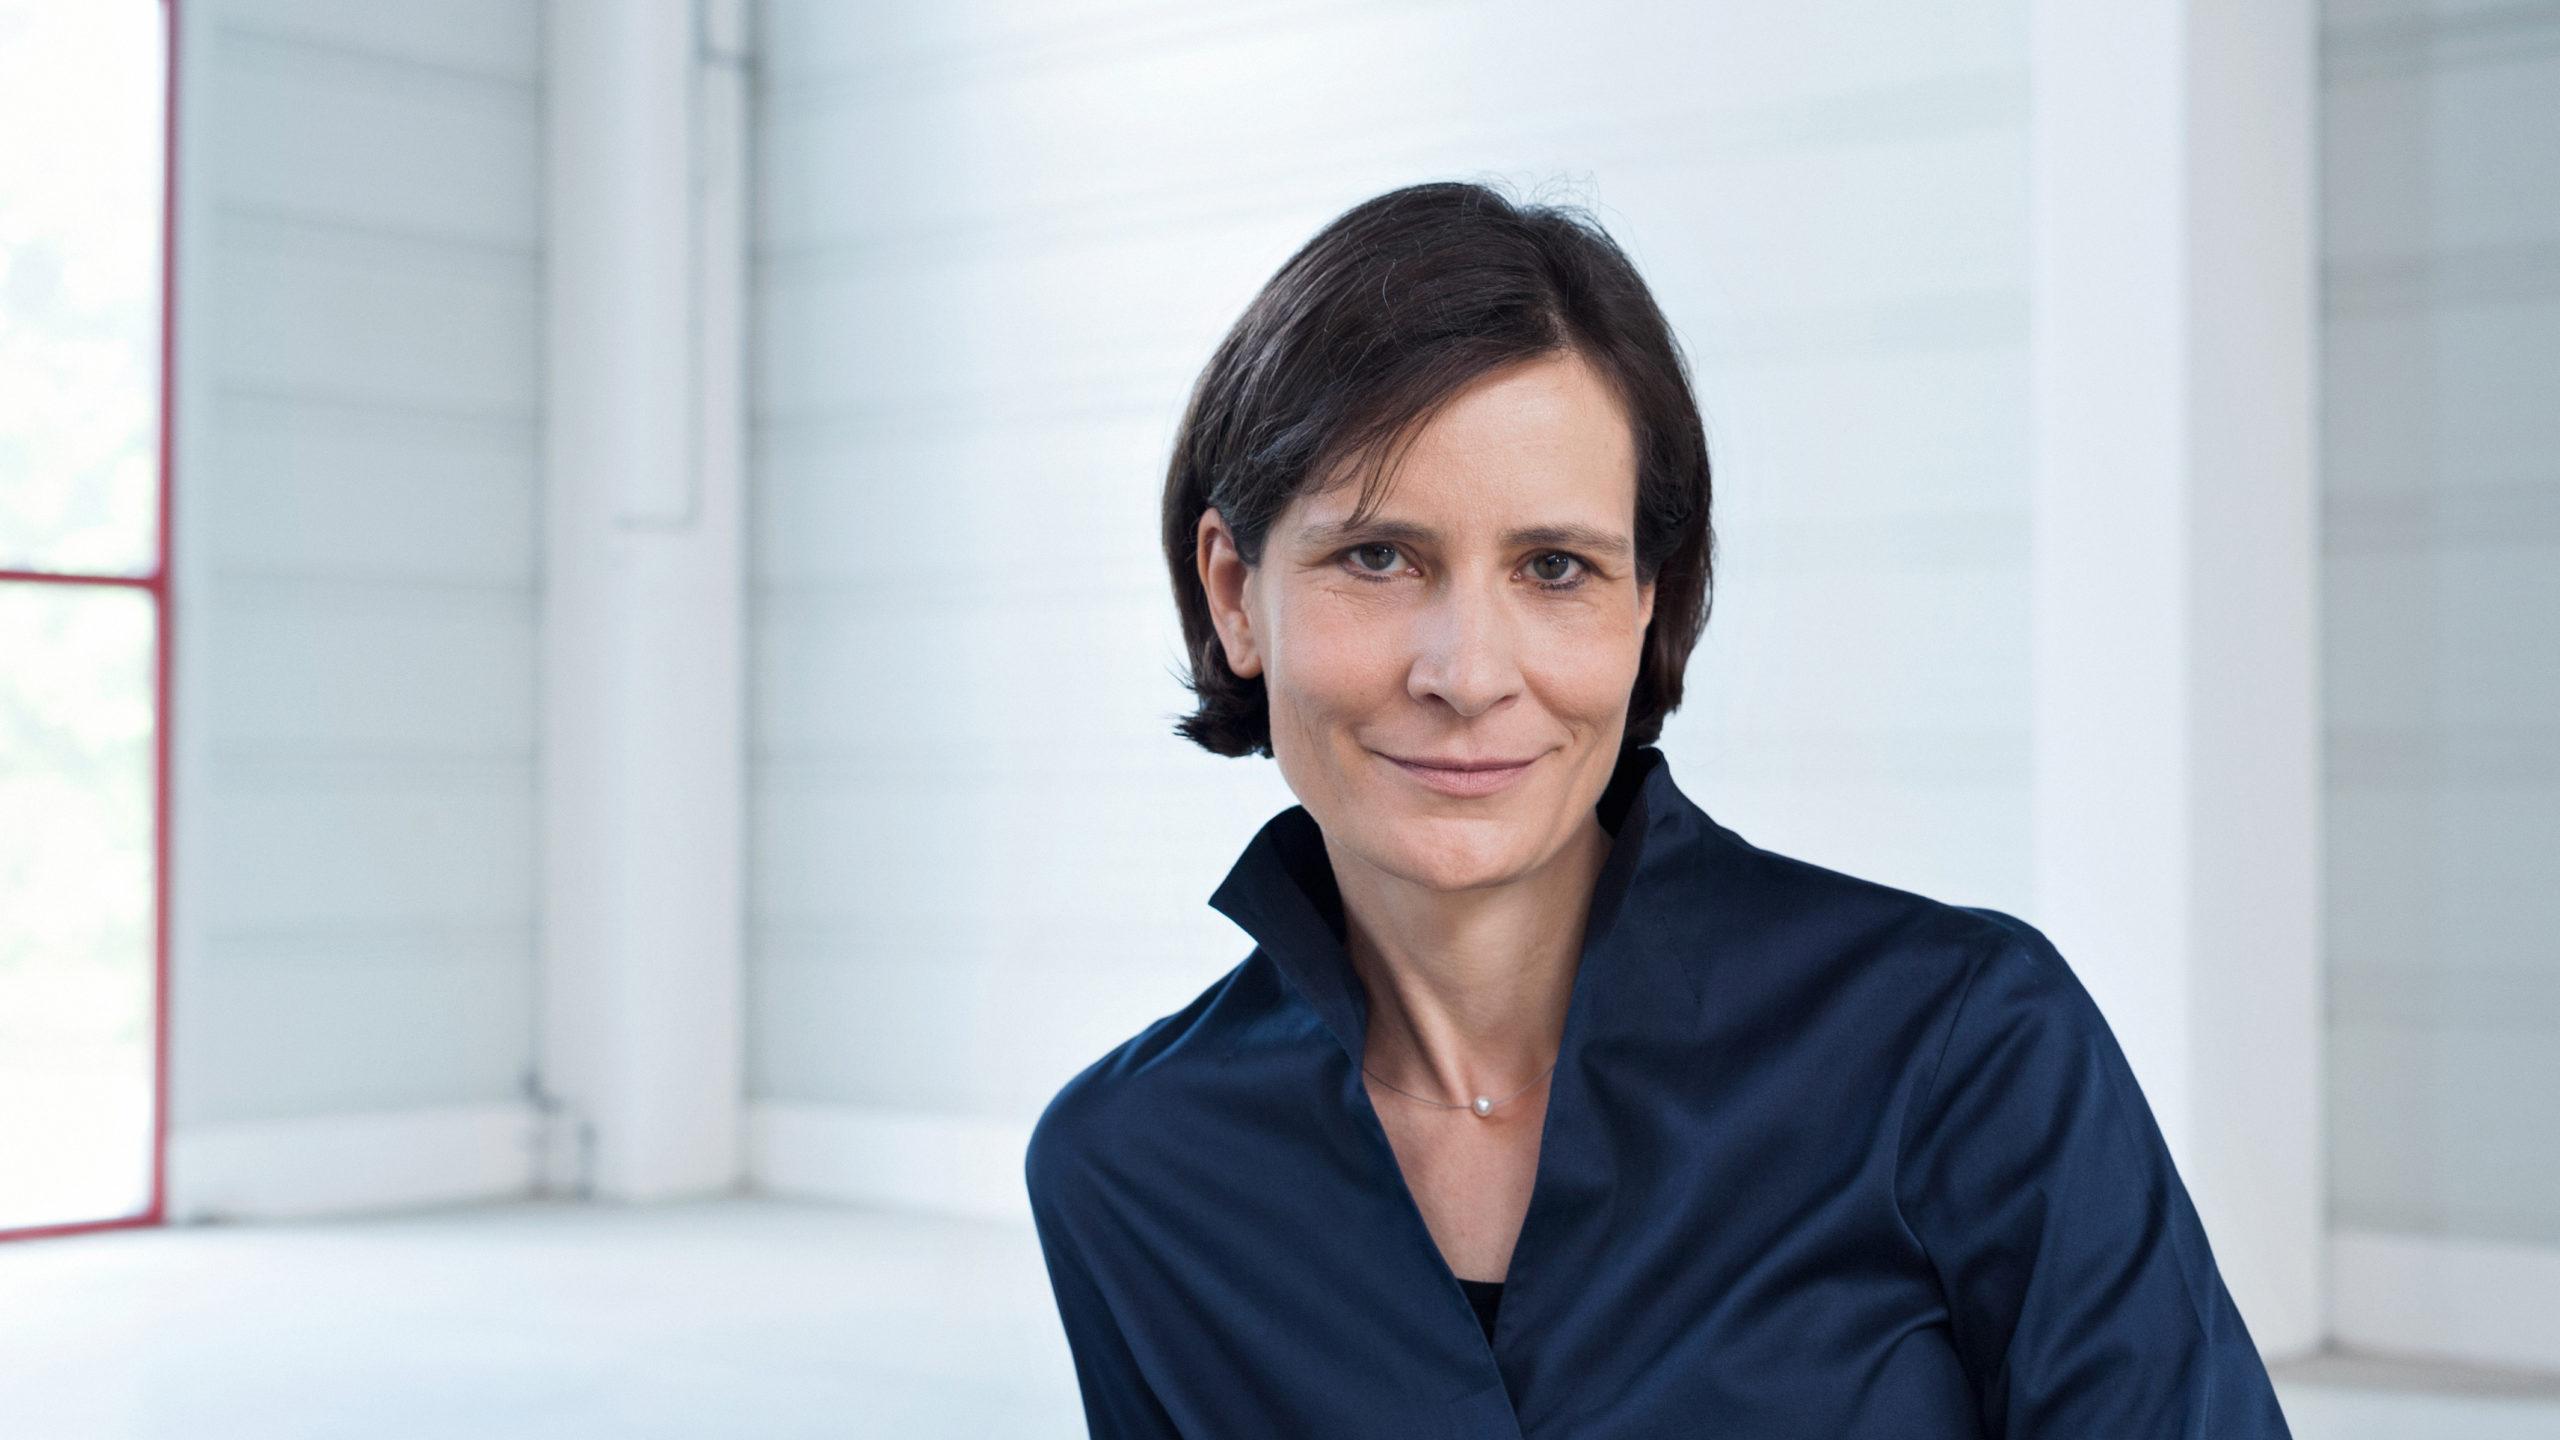 Simone Schiebold (Foto: Flad & Flad Communication GmbH)